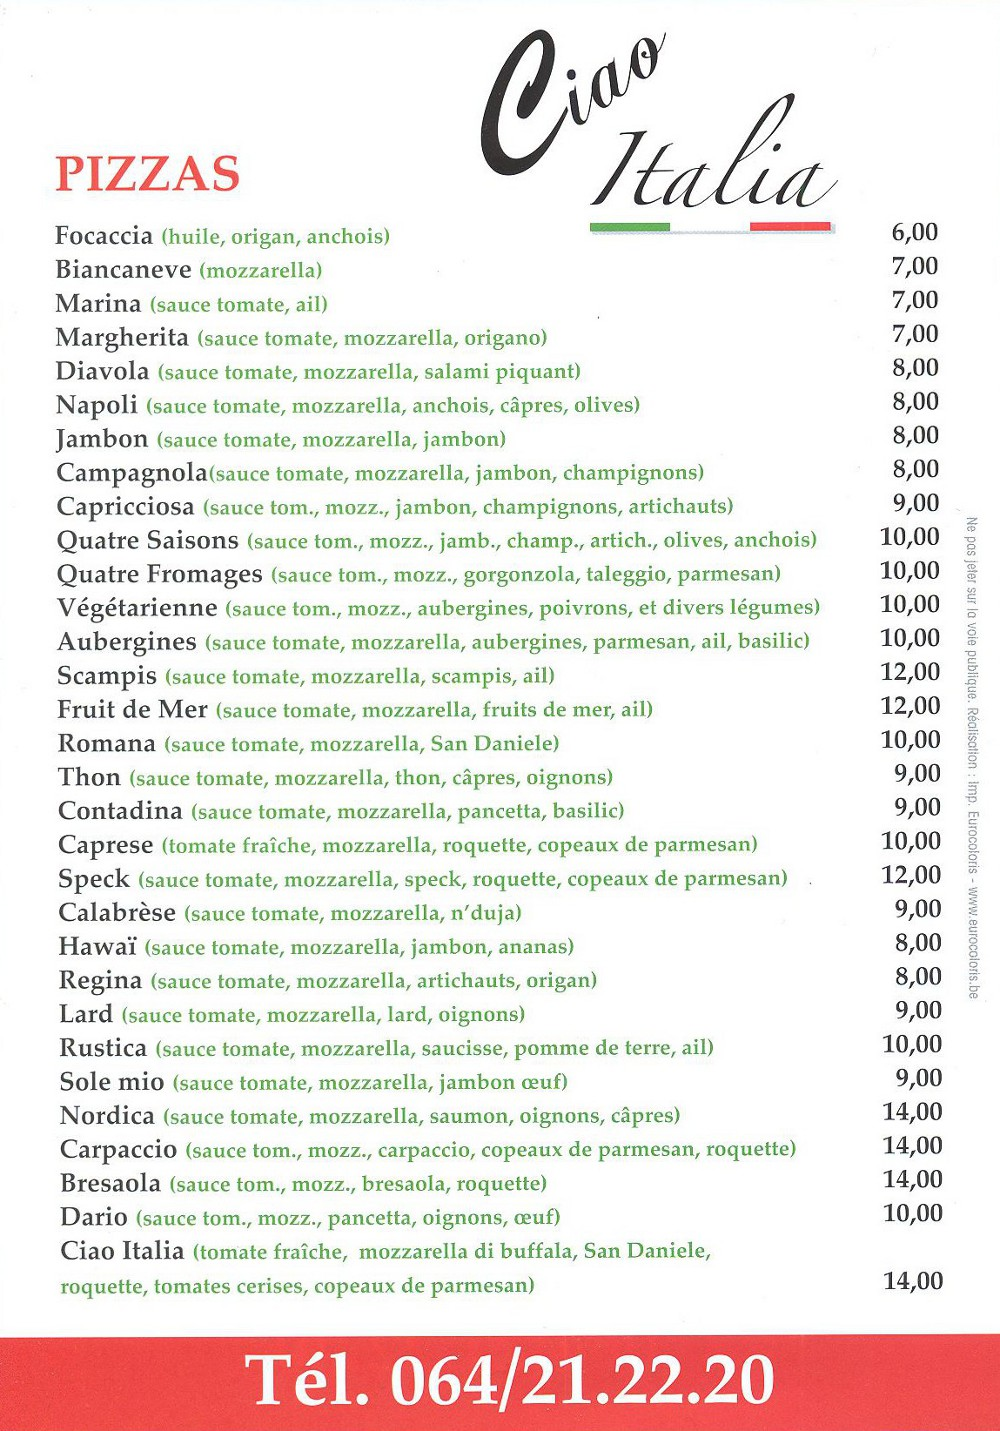 Ciao Italia Spécialités Italiennes & Pizzeria